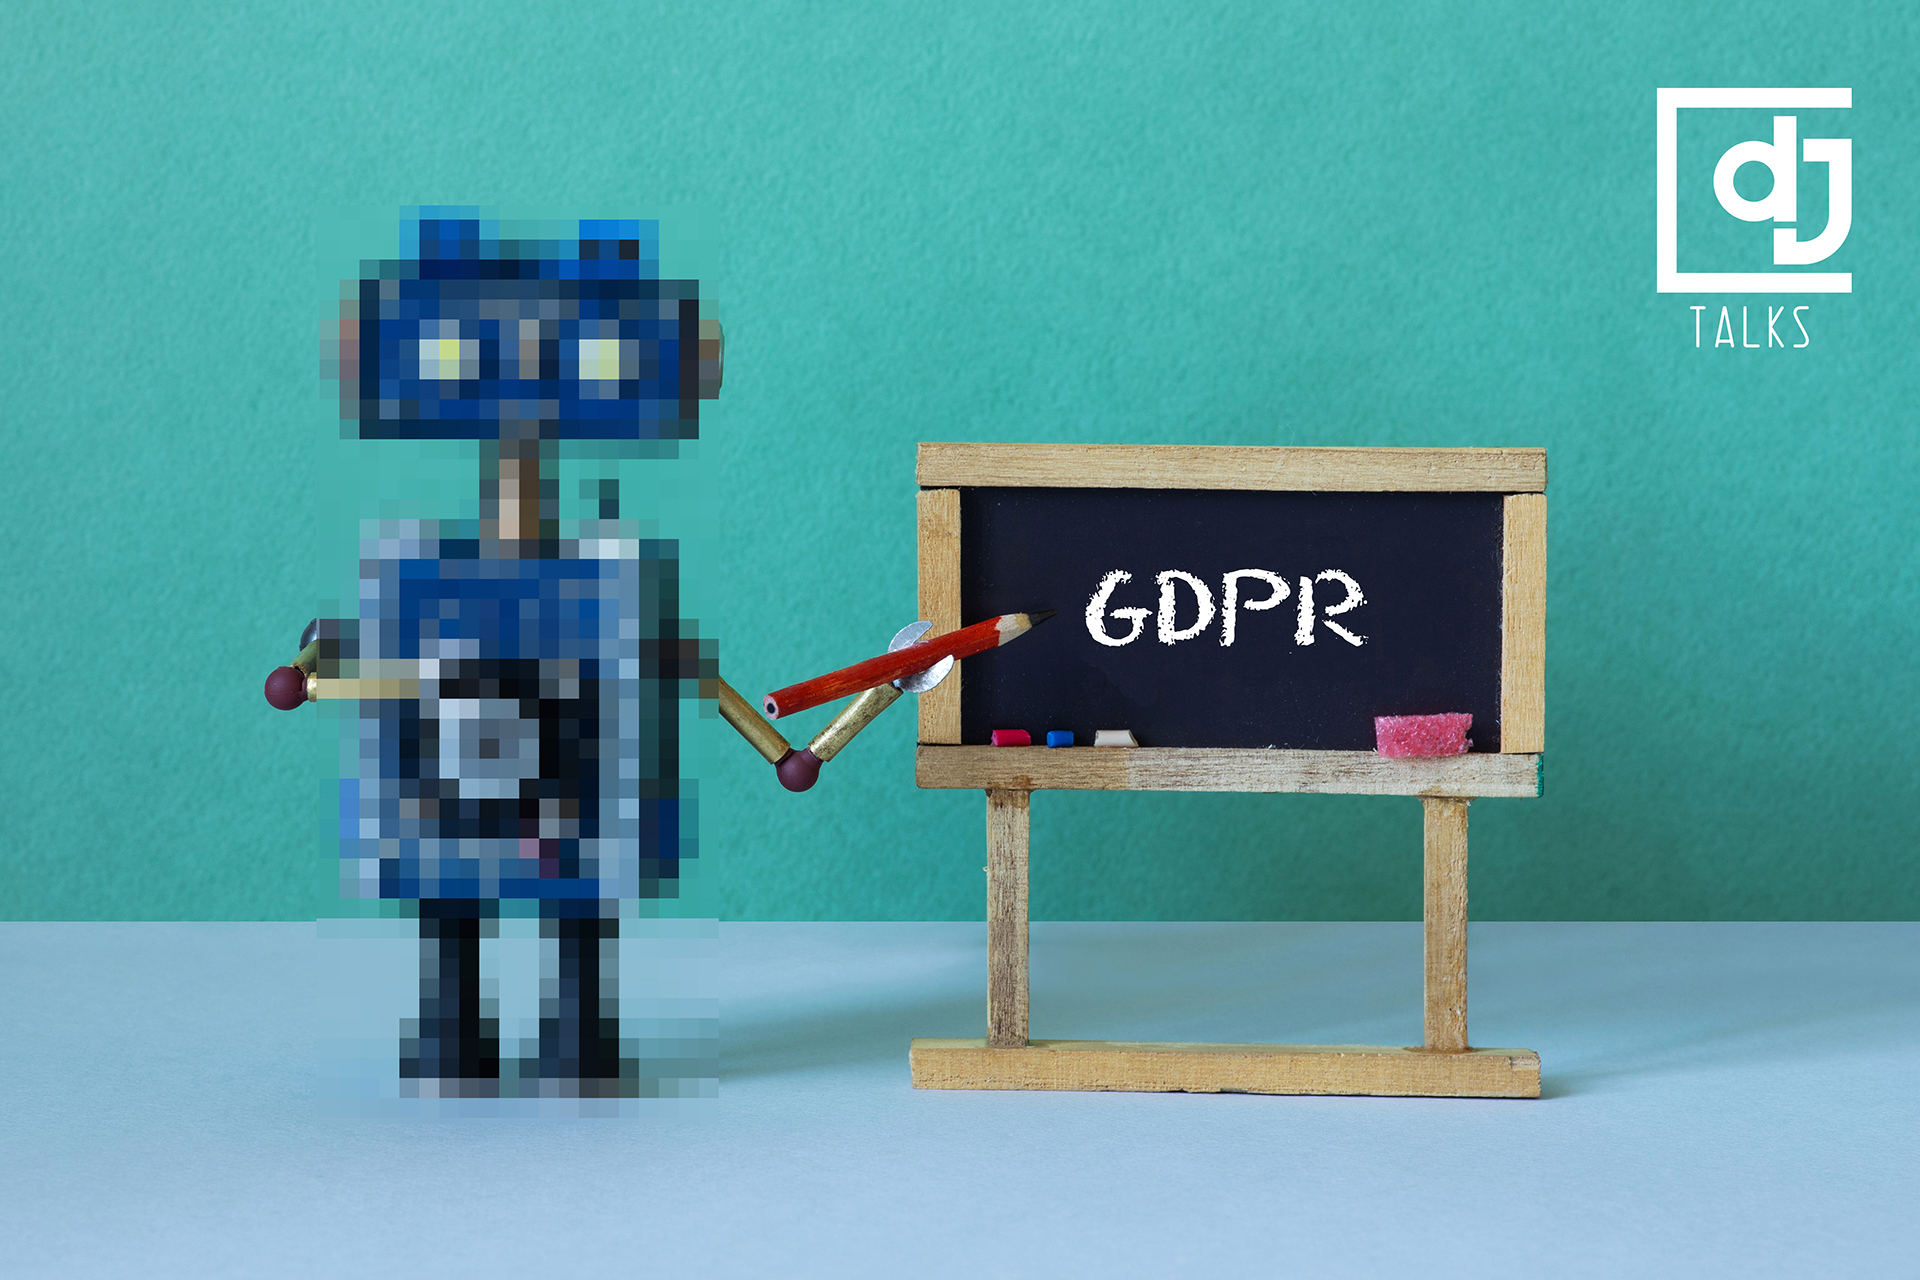 dj Talks GDPR